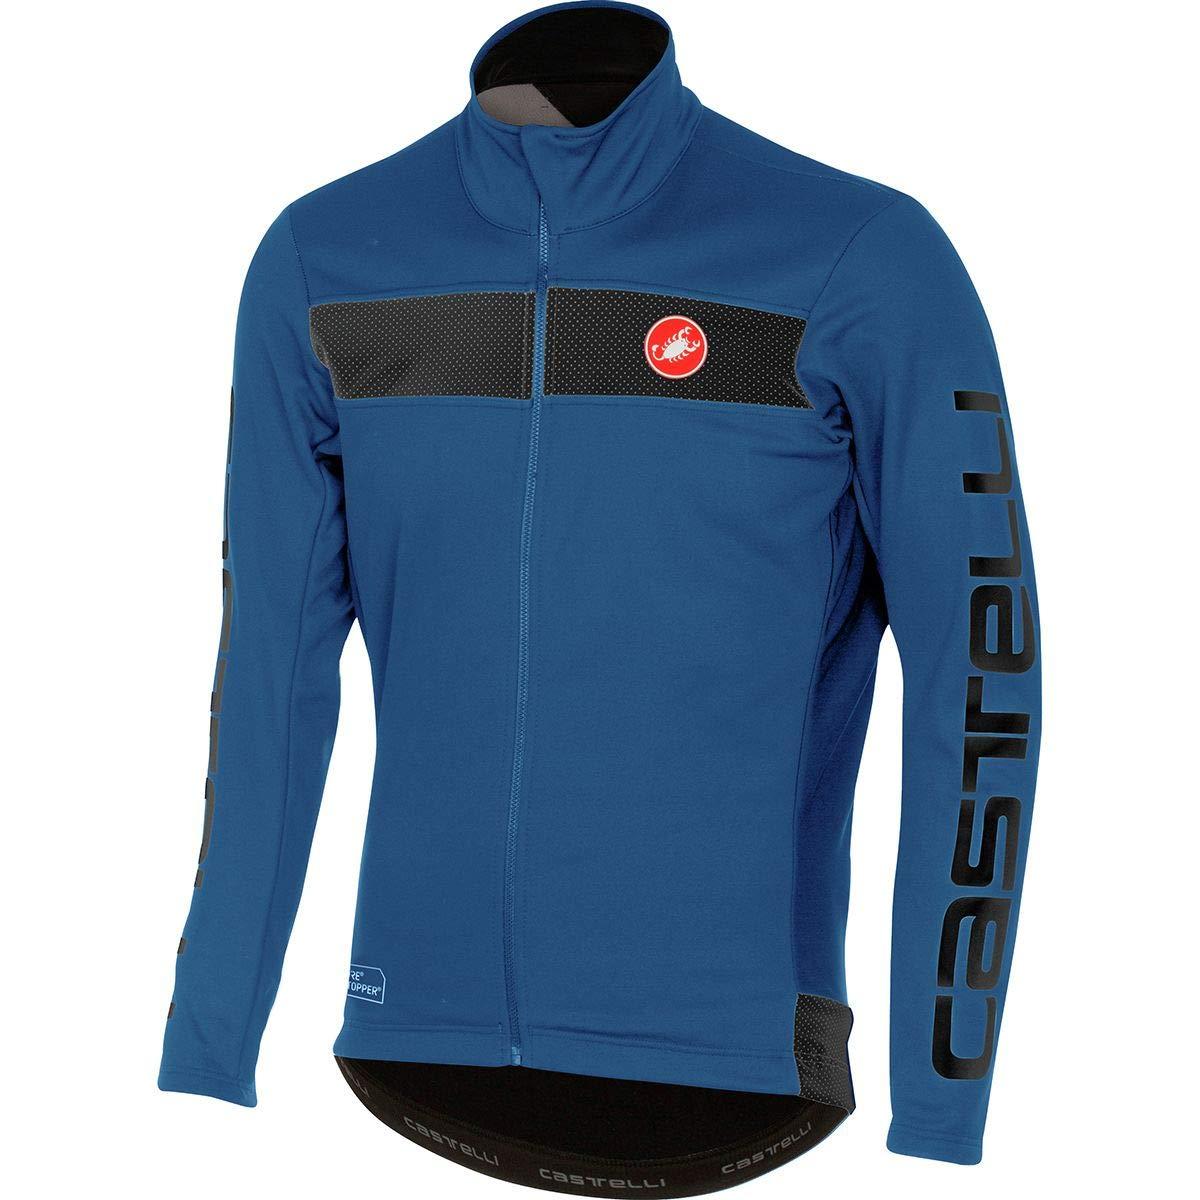 Castelli Raddoppia Jacket - Men's Ceramic Blue, M